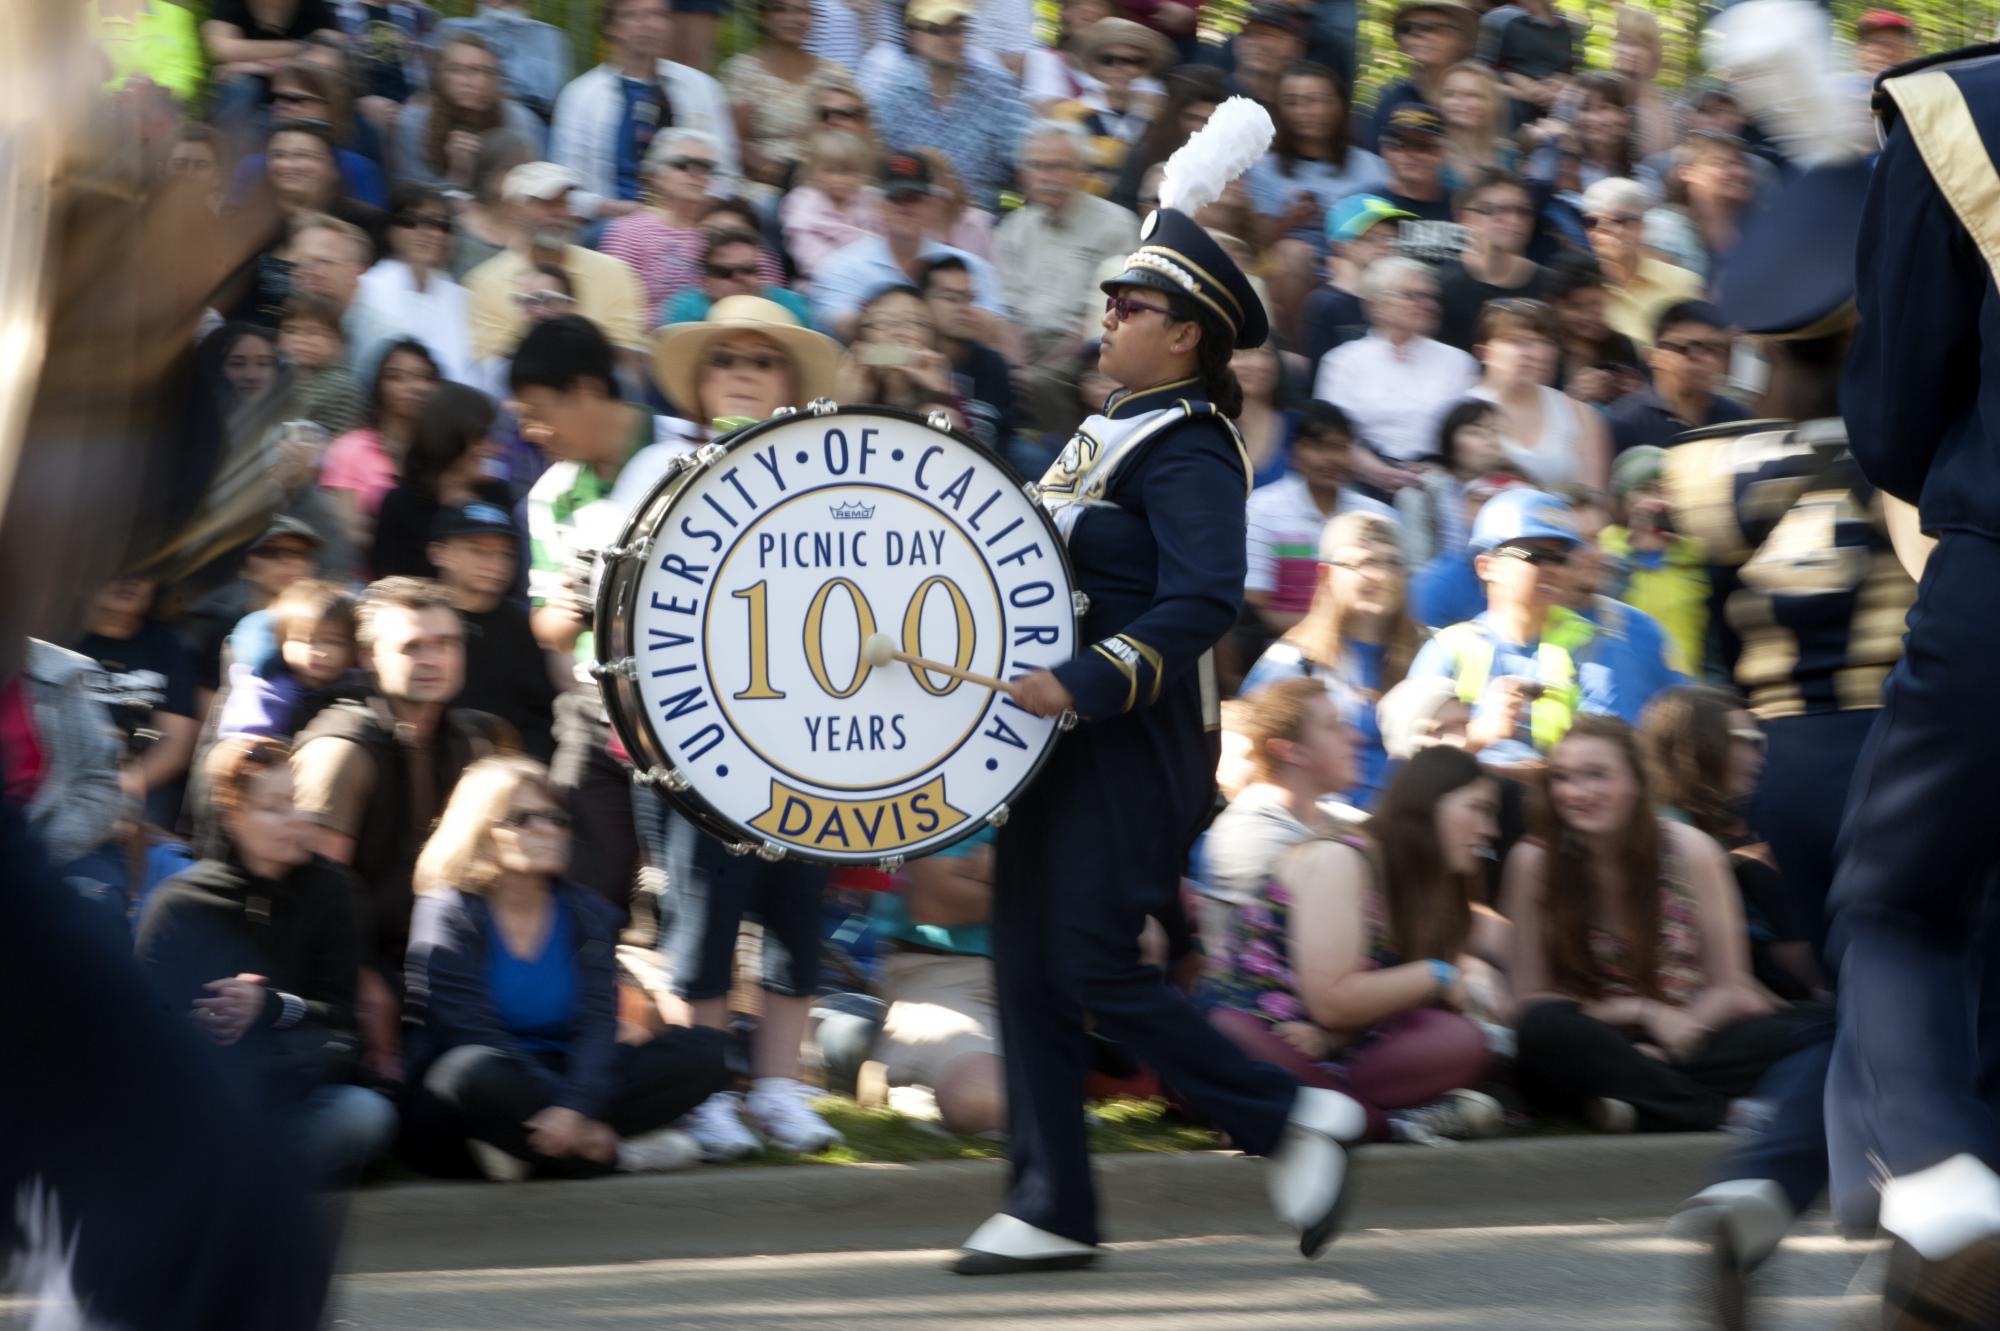 UC Davis Picnic Day